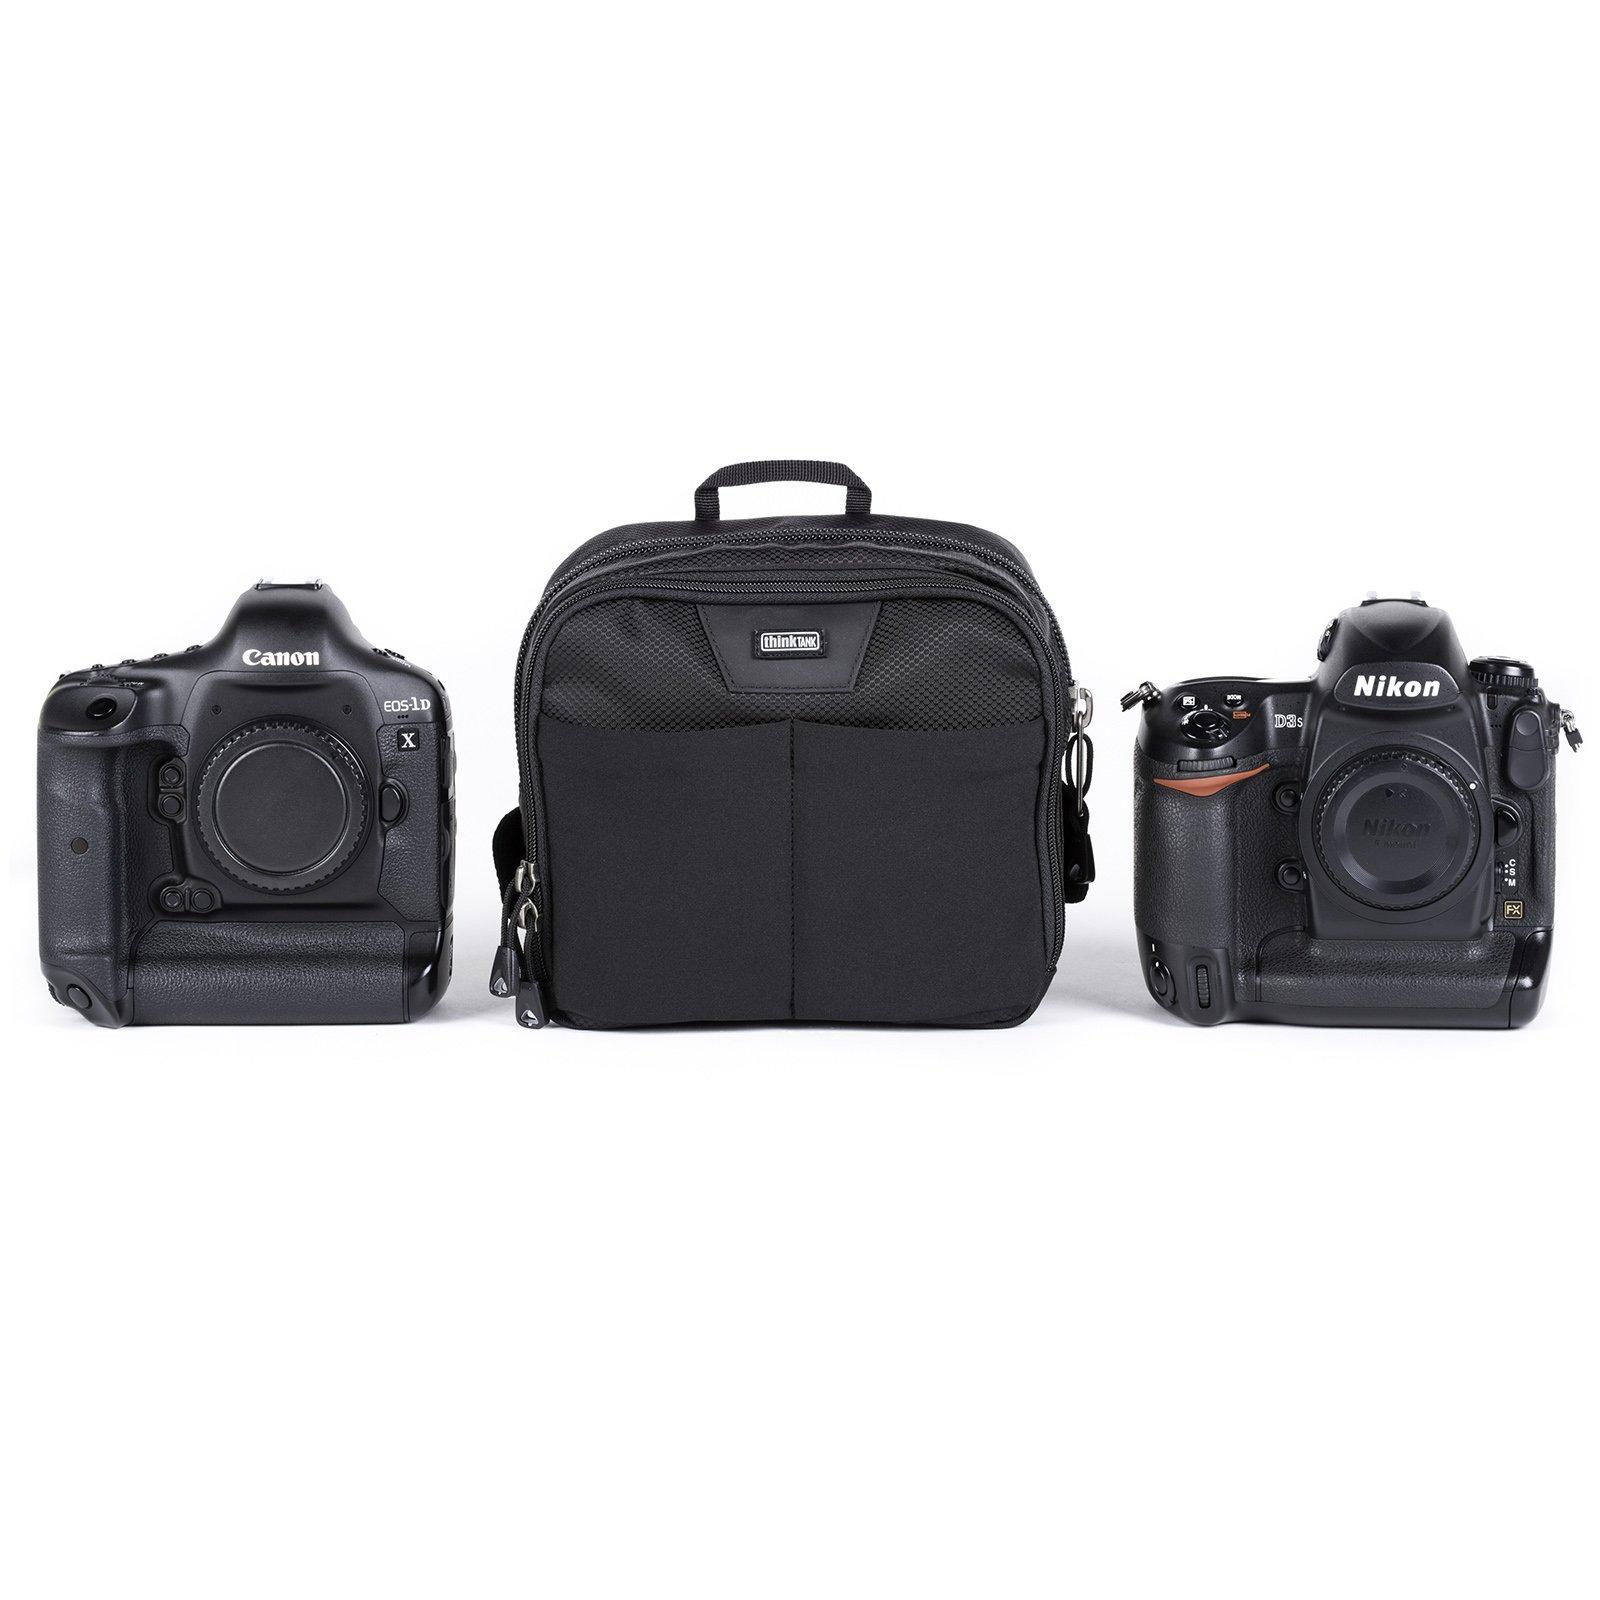 Think Tank Photo Speed Changer V3.0 Waist Pack Camera Bag (Black)